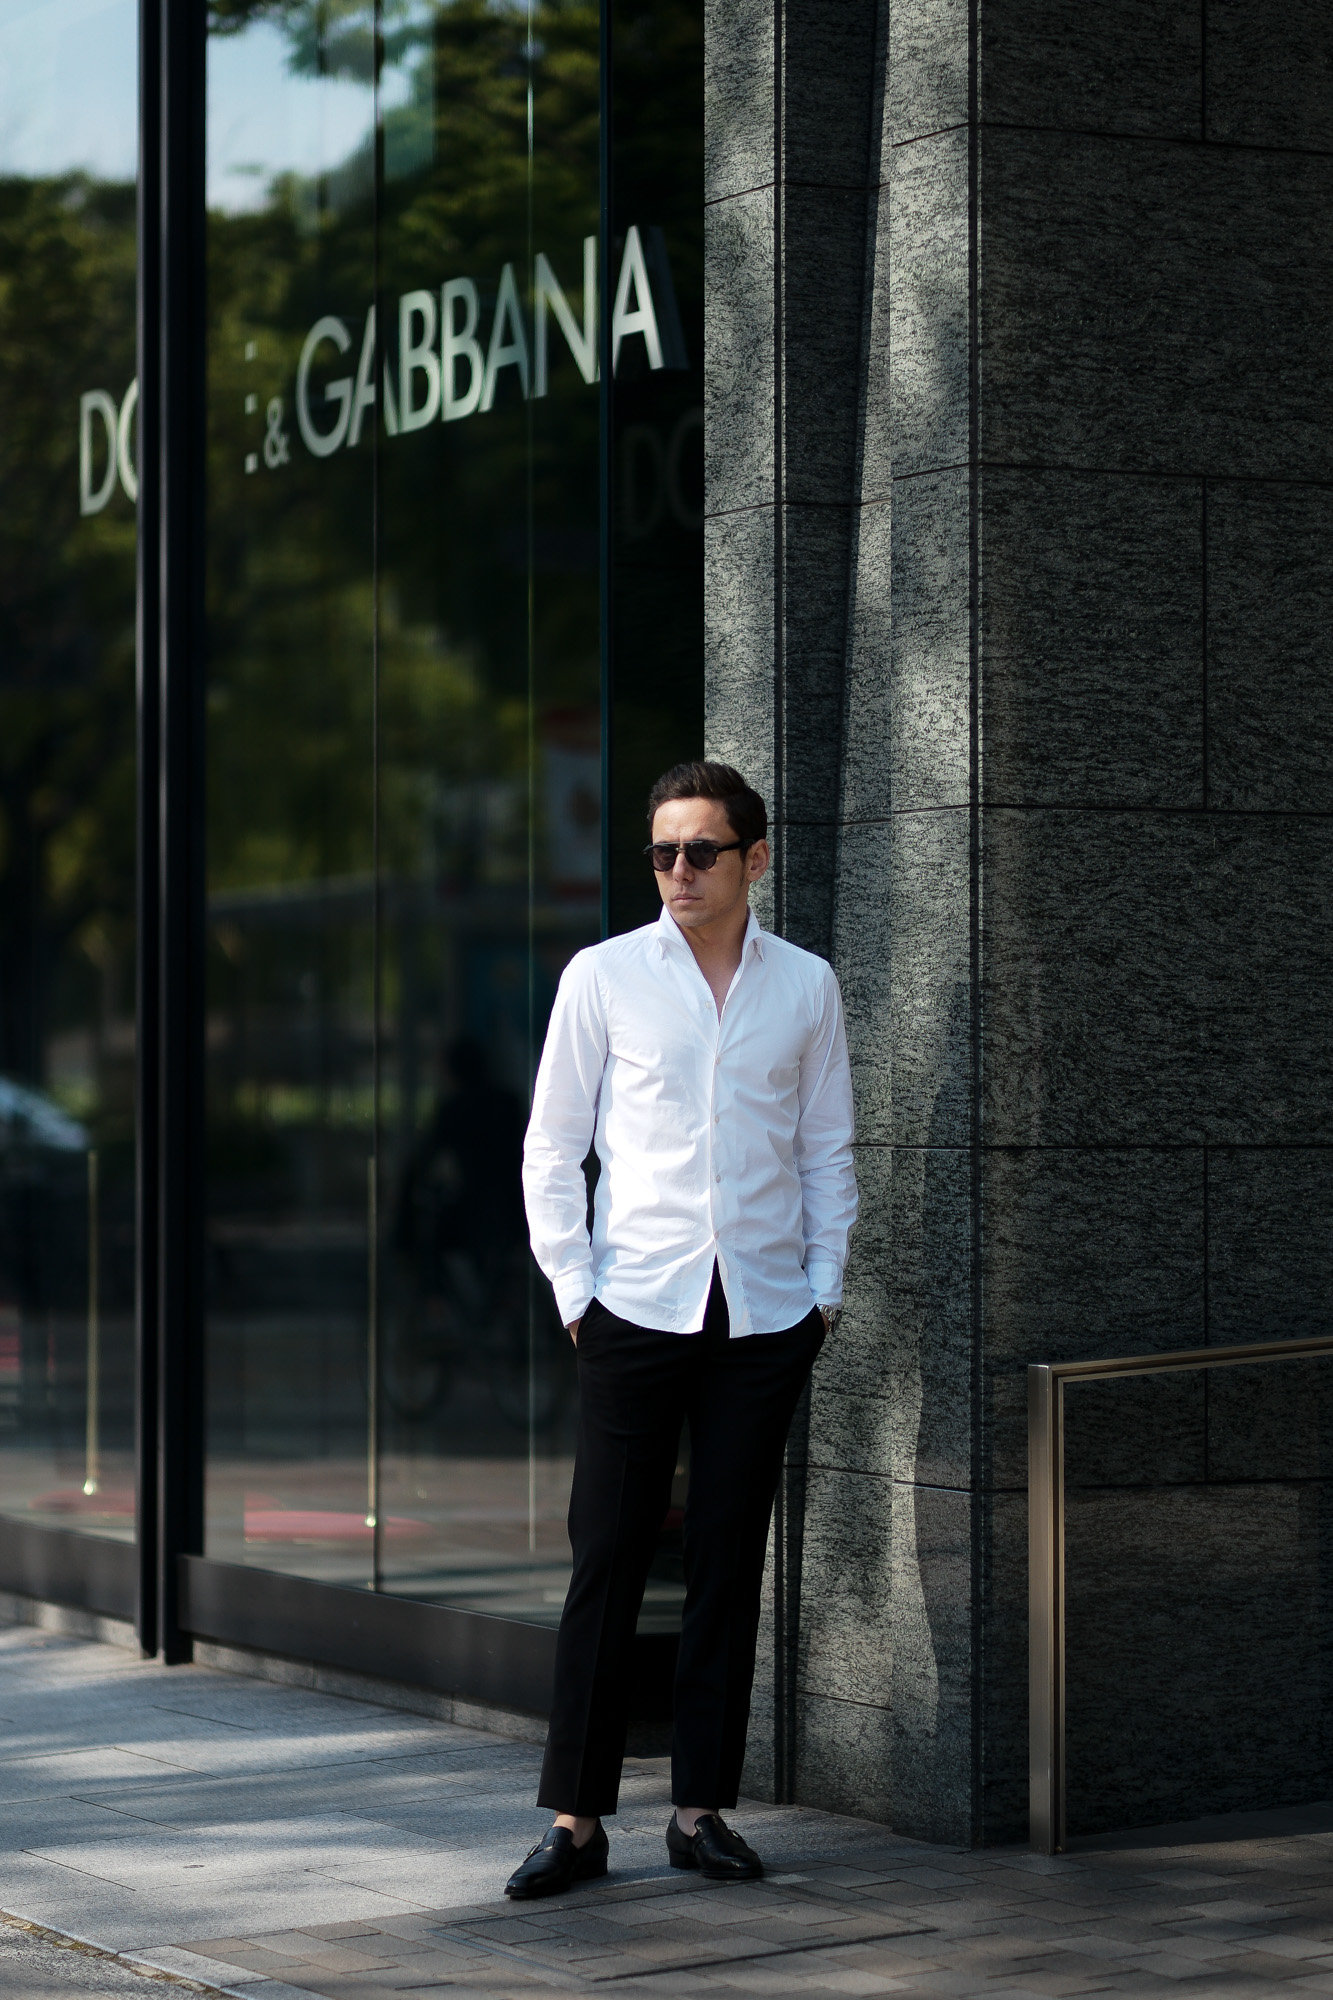 Finamore (フィナモレ) SEUL ITALIAN COLOR STRETCH COTTON SHIRTS ストレッチコットン ワンピースカラー シャツ WHITE (ホワイト・01) made in italy (イタリア製) 2020 春夏新作 愛知 名古屋 altoediritto アルトエデリット